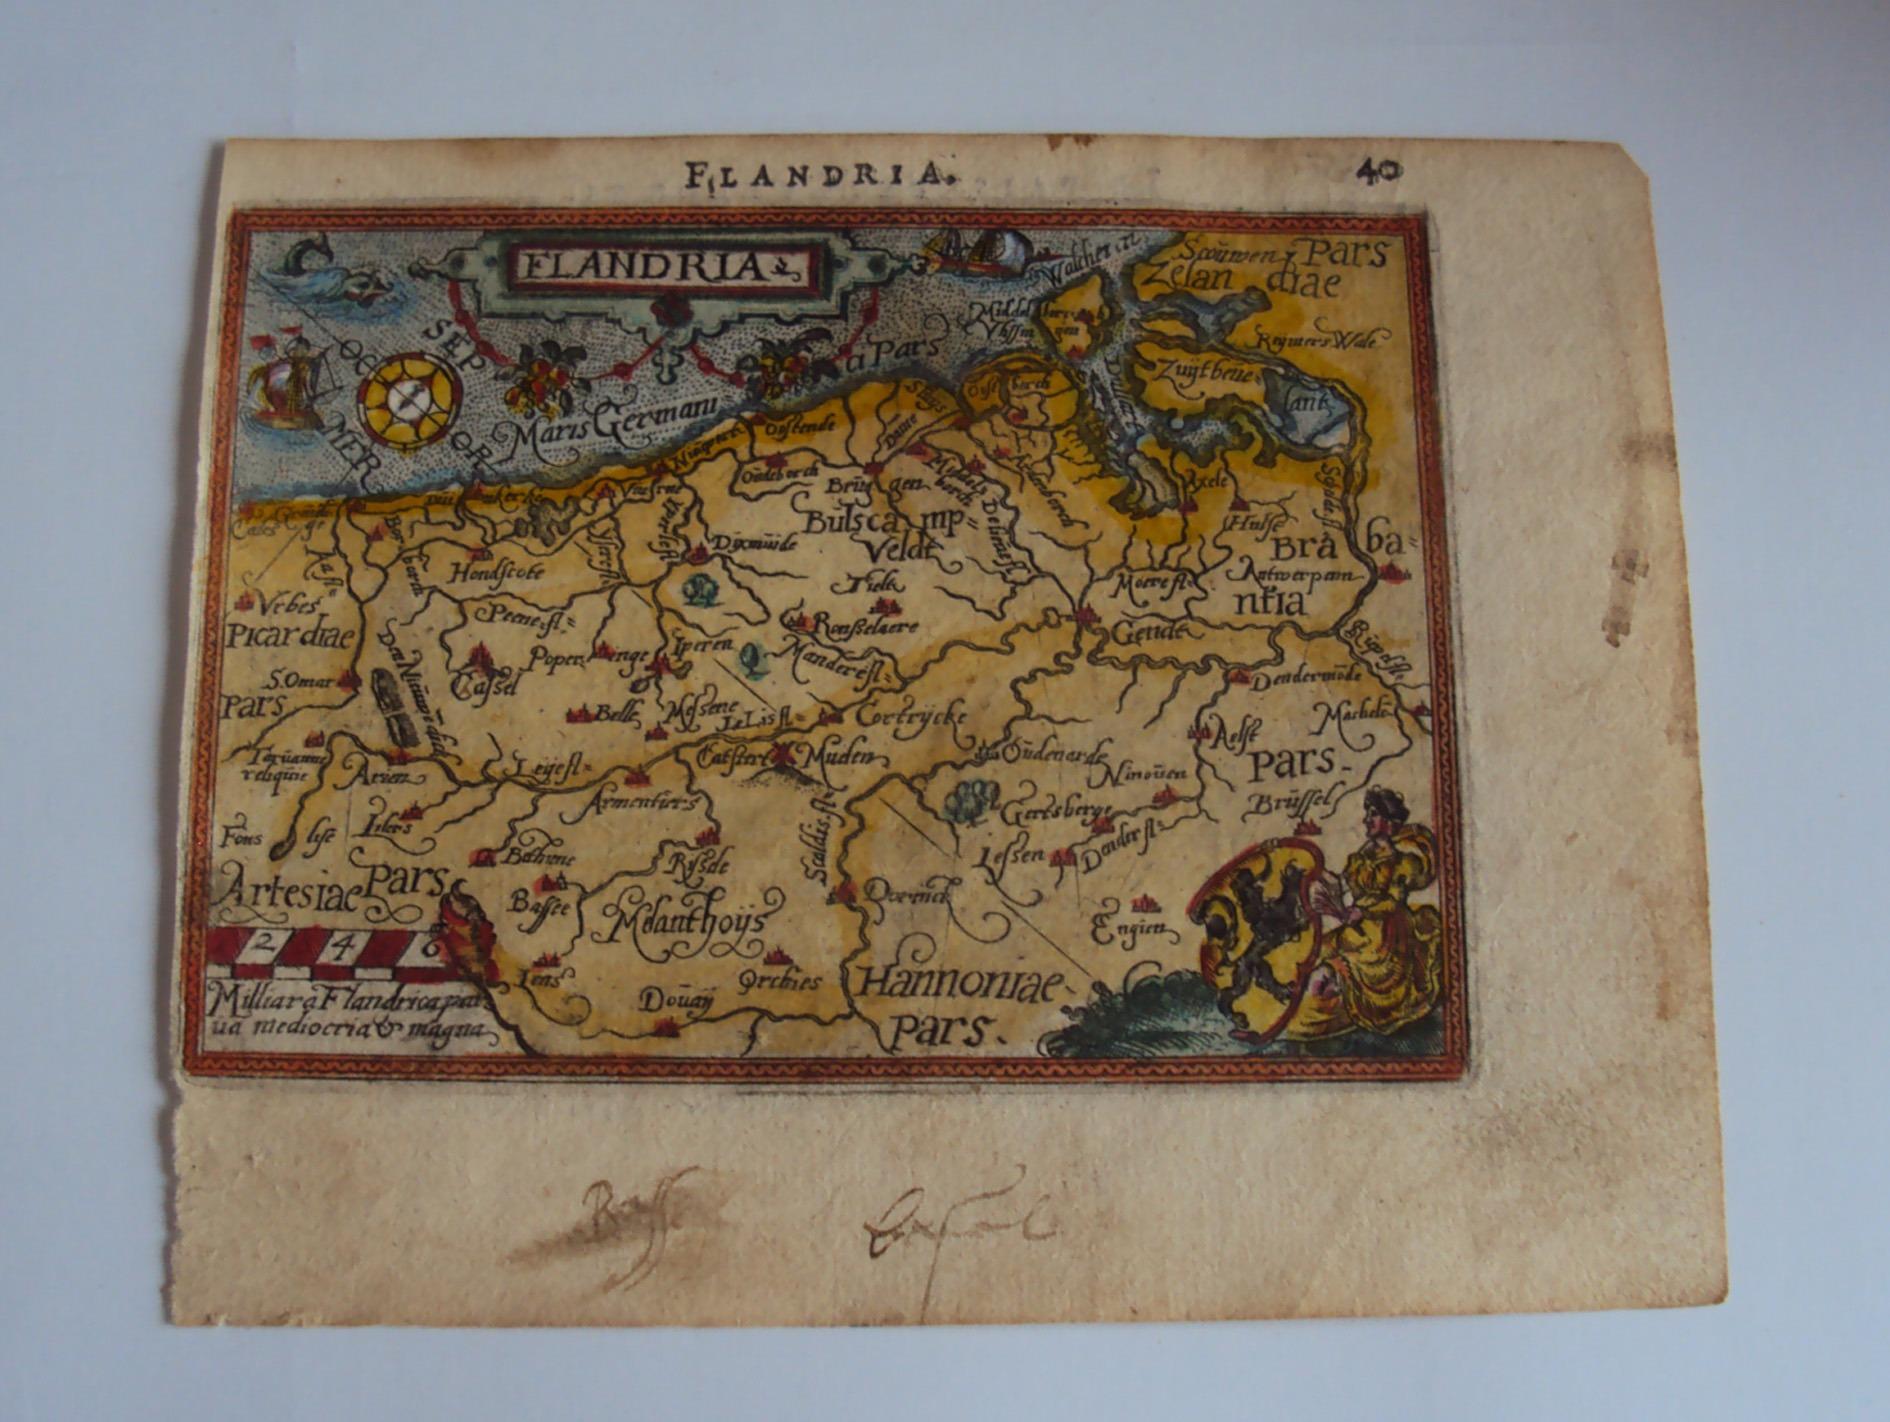 Antique Copper Etching Map 'Flandres